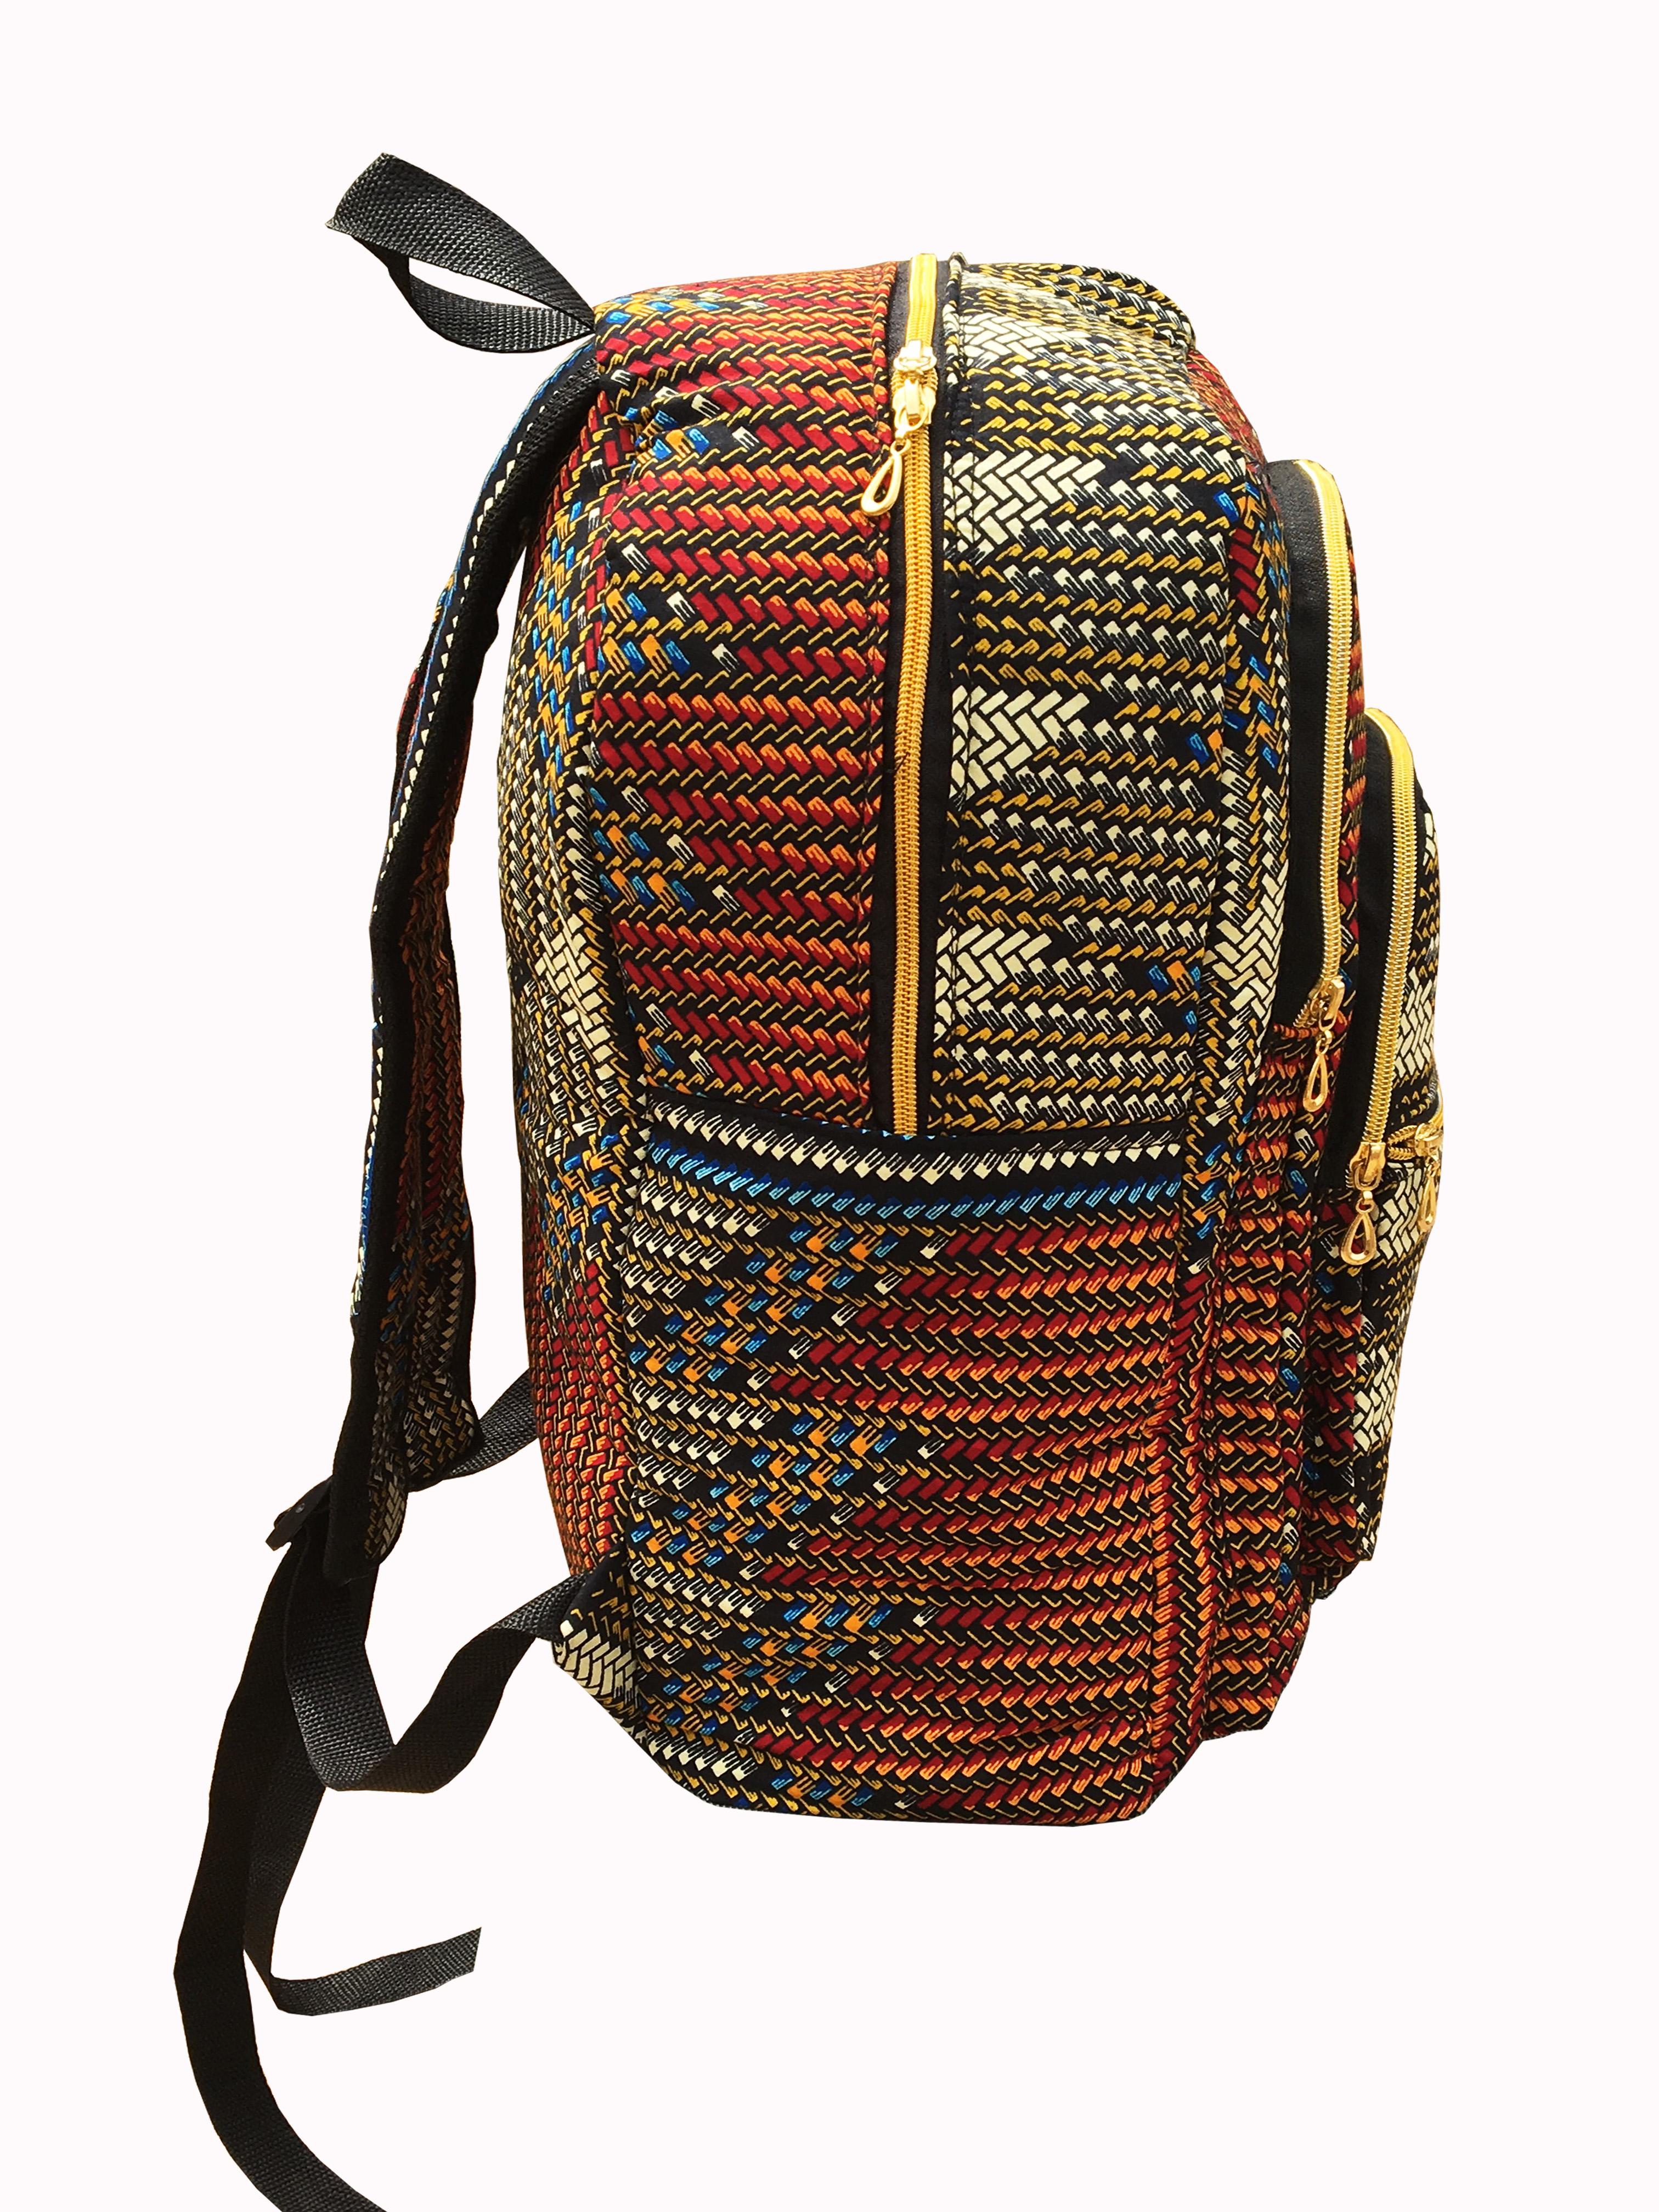 Ankara Wax African Print Book Bag Rucksack Handmade Backpack Handmade Bag 183 Ramsjay Designs